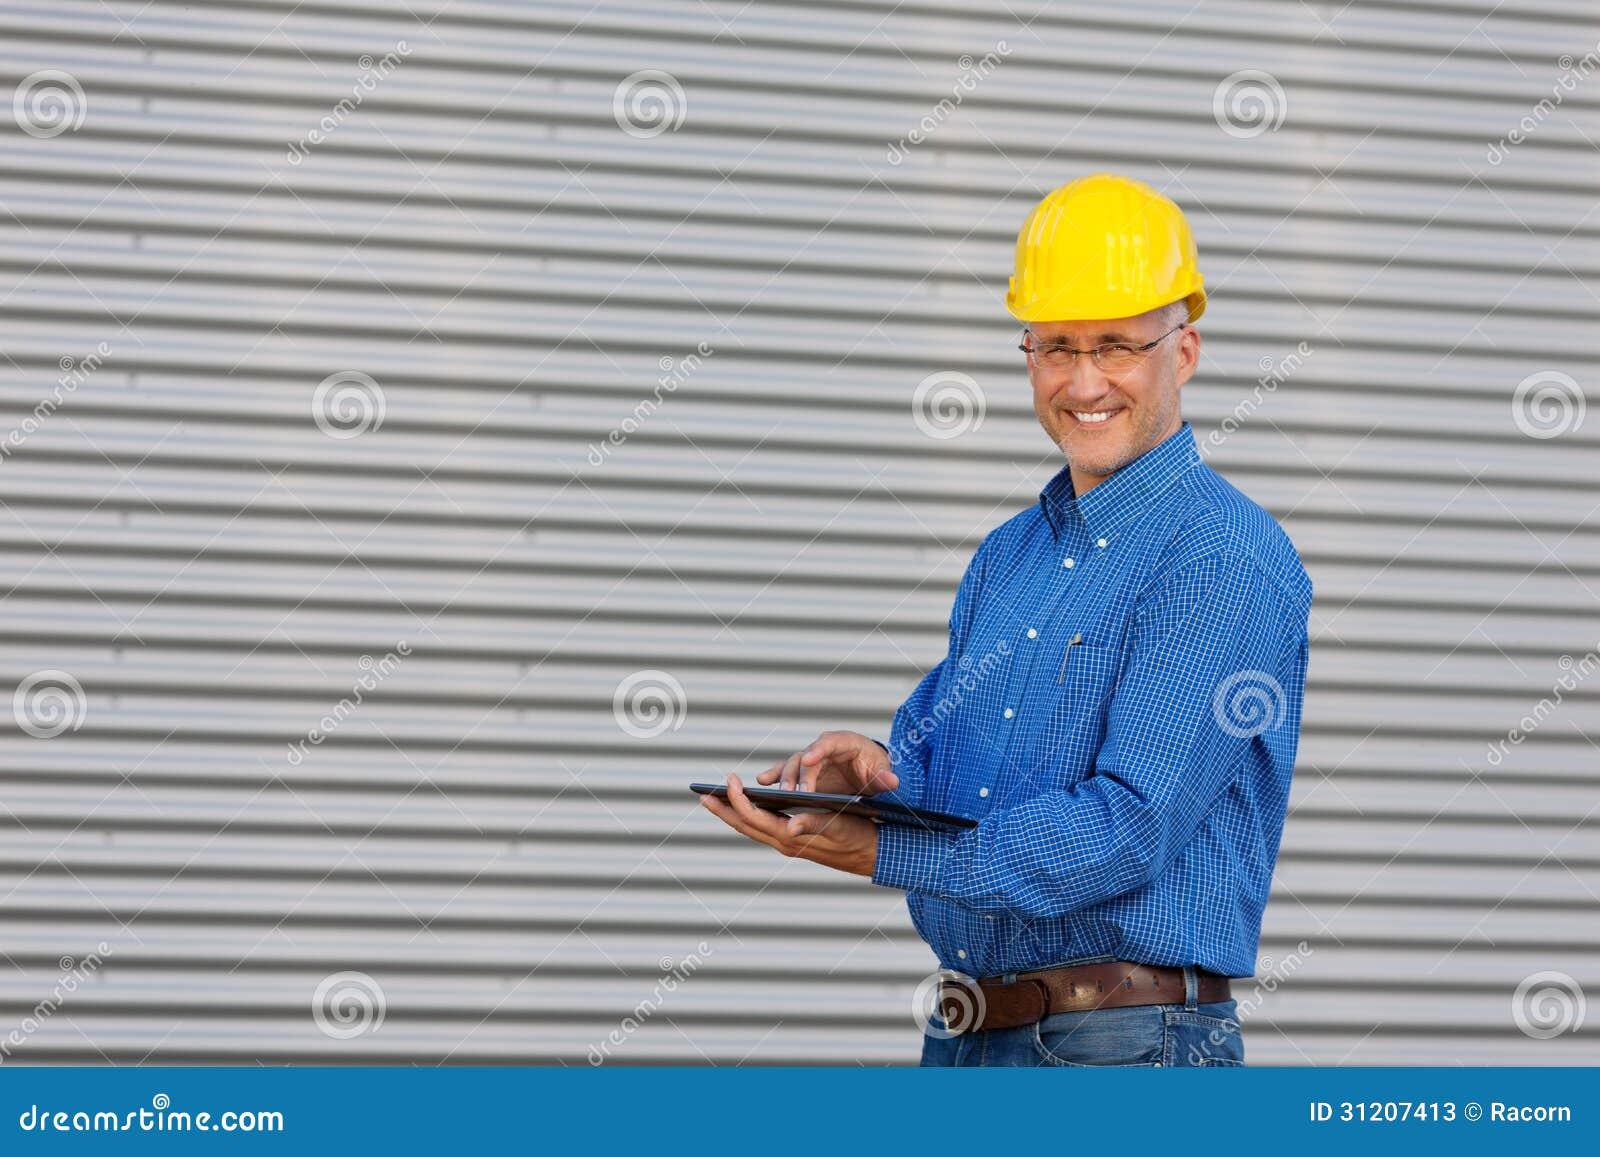 Mature Architect Using Digital Tablet